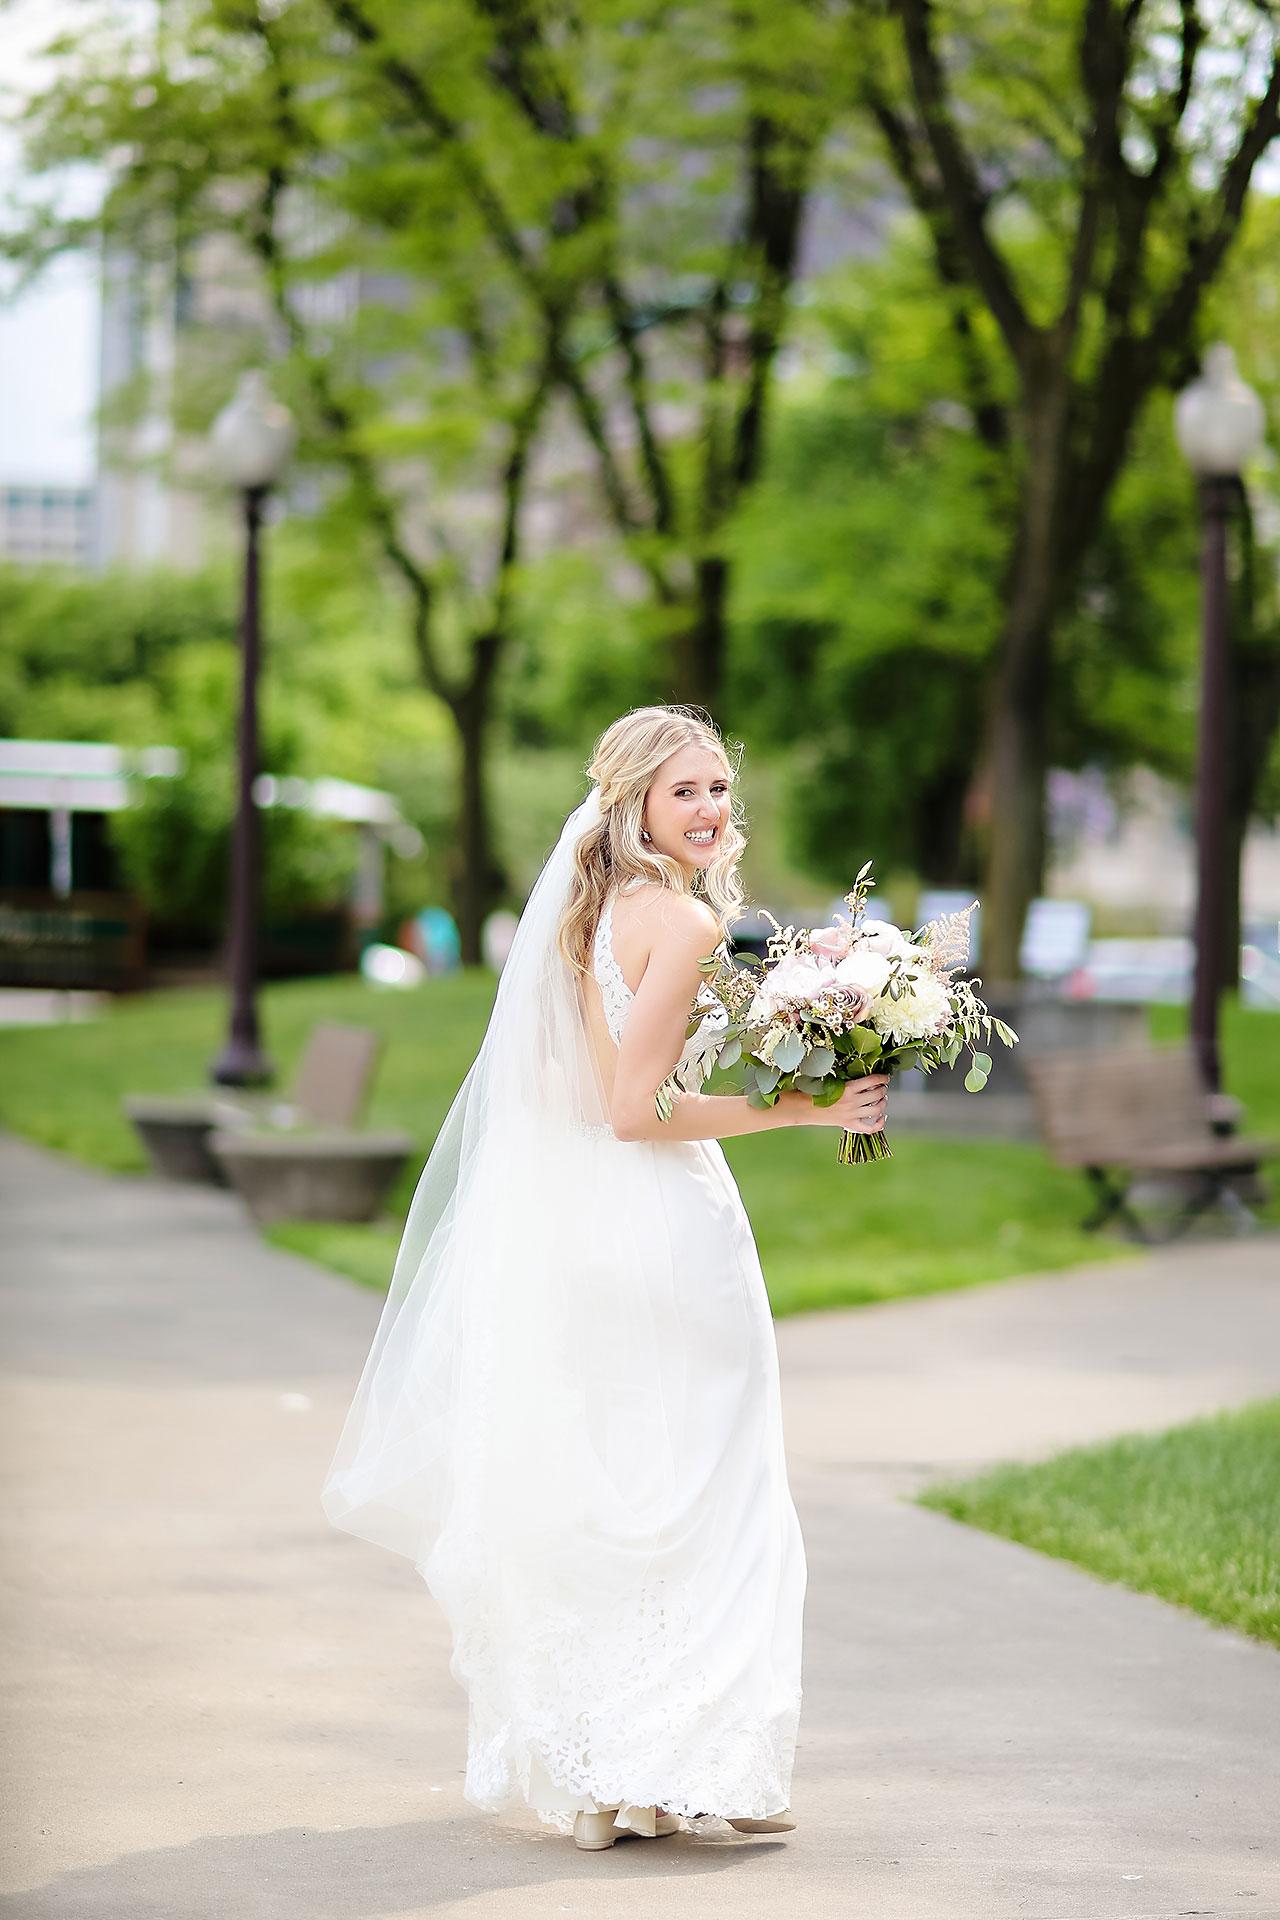 Allison Jeff Union Station Crowne Plaza Indianapolis wedding 180